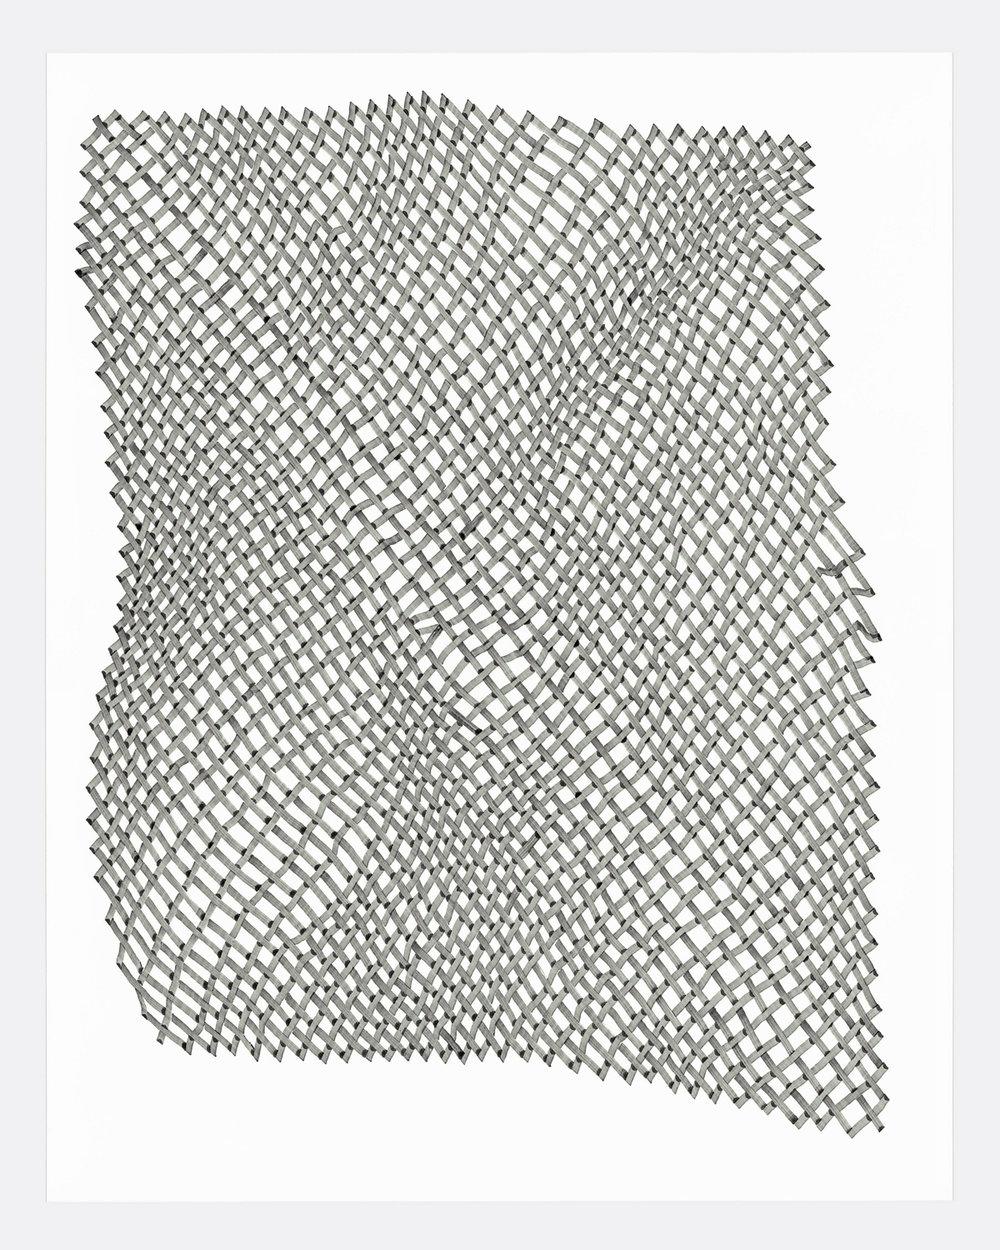 Woven Lines 4 ,  2019   acrylic on yupo medium 14 x 11 in (35.56 x 27.9 cm)